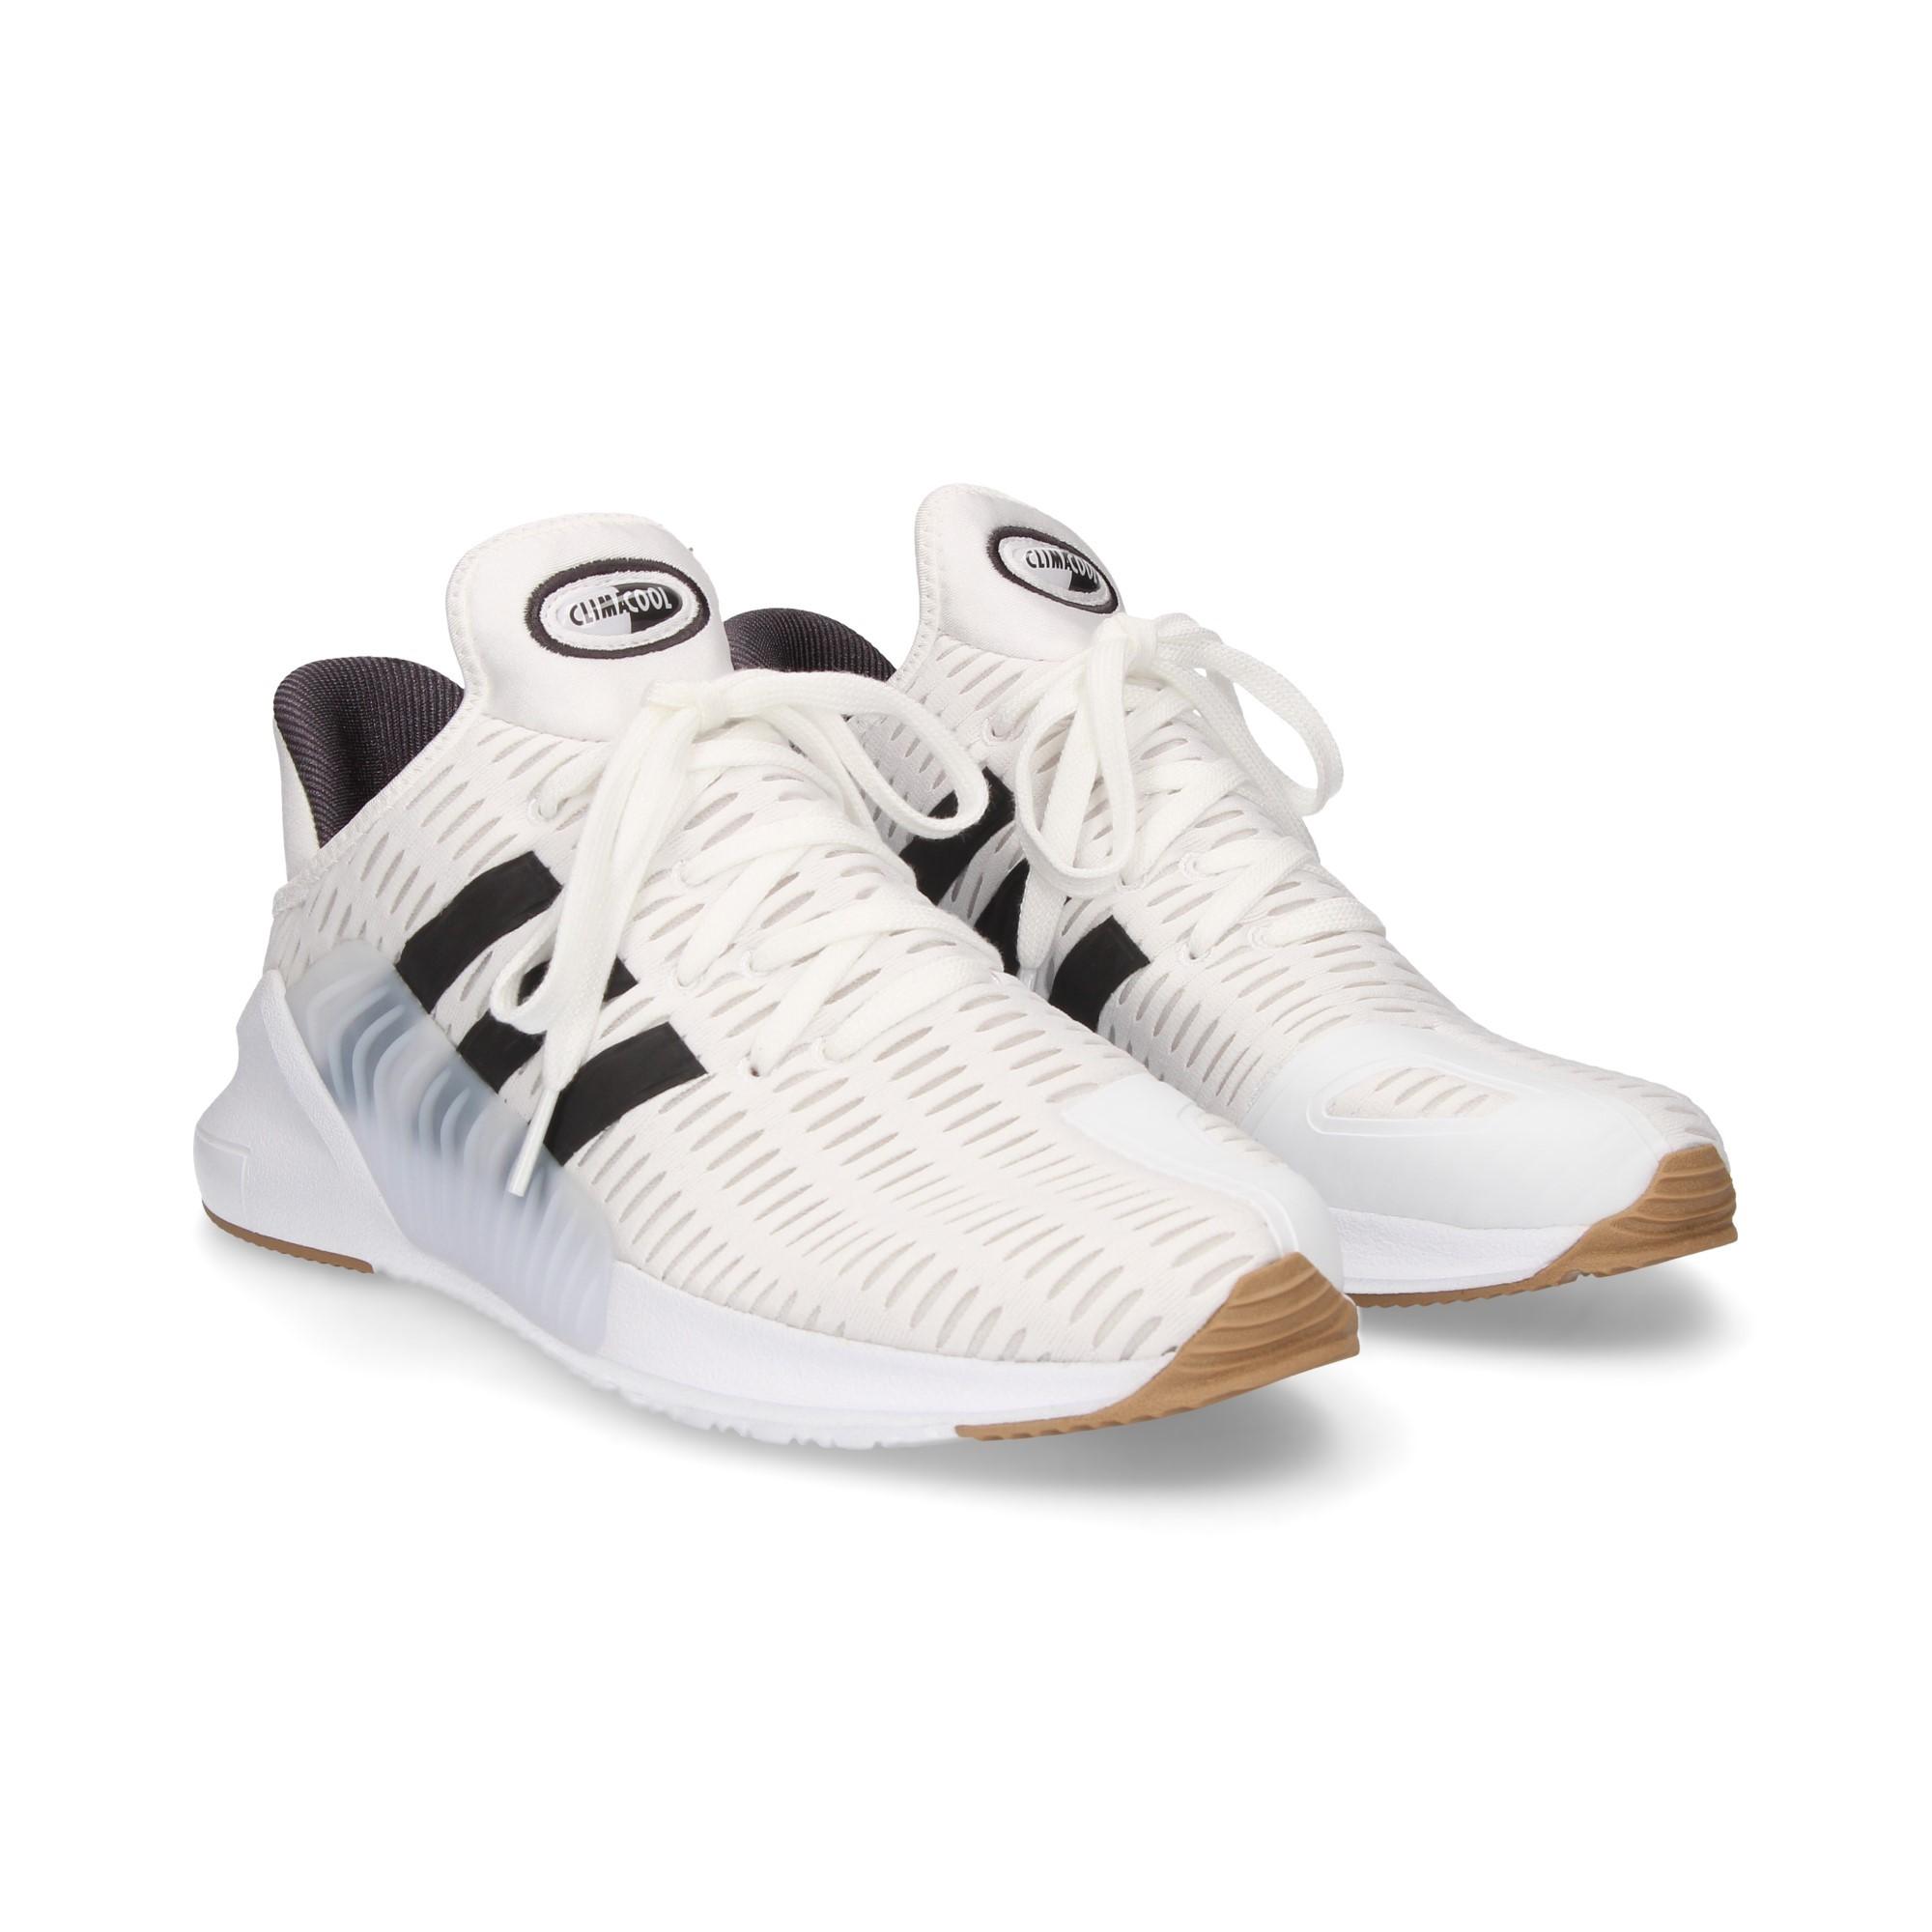 Da Ginnastica Adidas Scarpe Climacool Uomo Blanco wONnmvy8P0